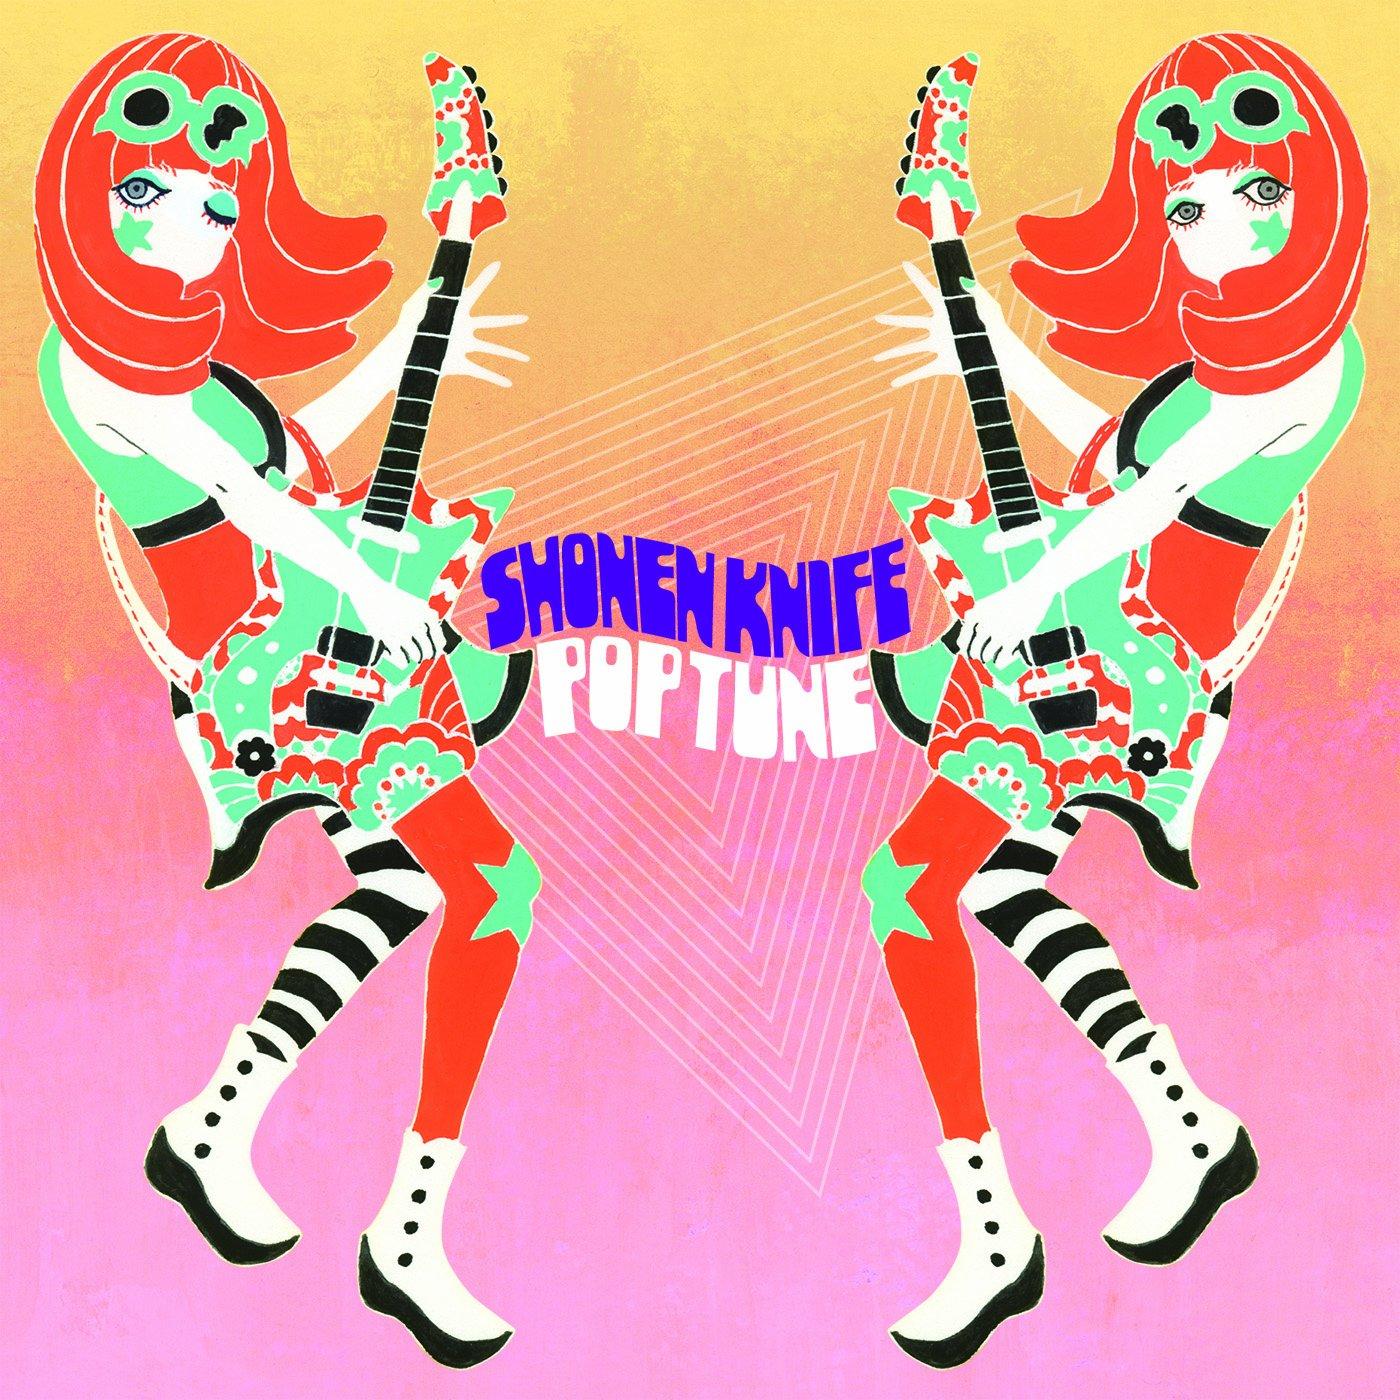 Shonen Knife - Pop Tune (2012) [FLAC] Download